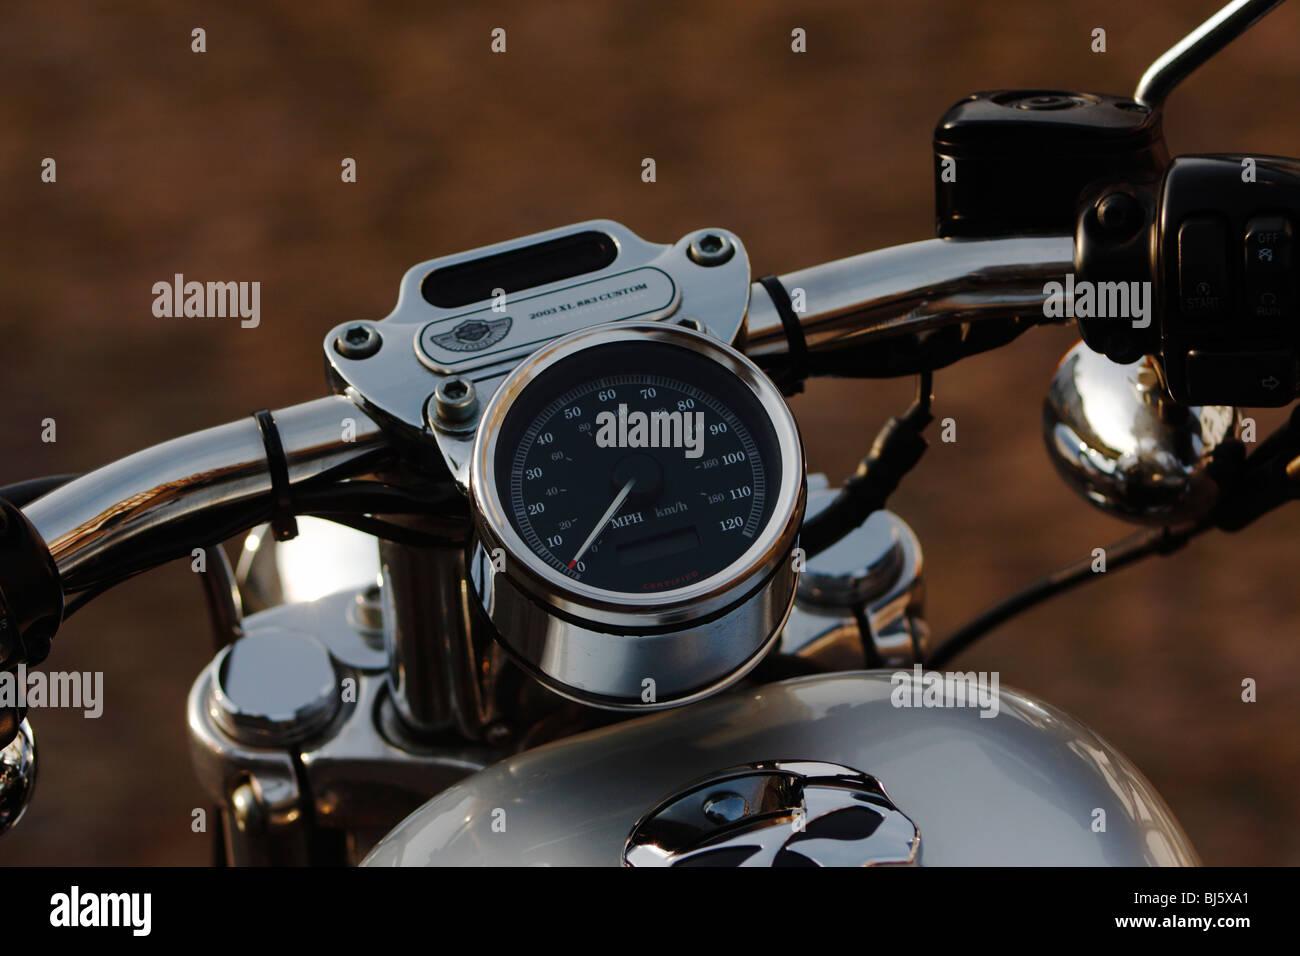 Harley Davidson Tank Badge Stock Photos & Harley Davidson Tank Badge